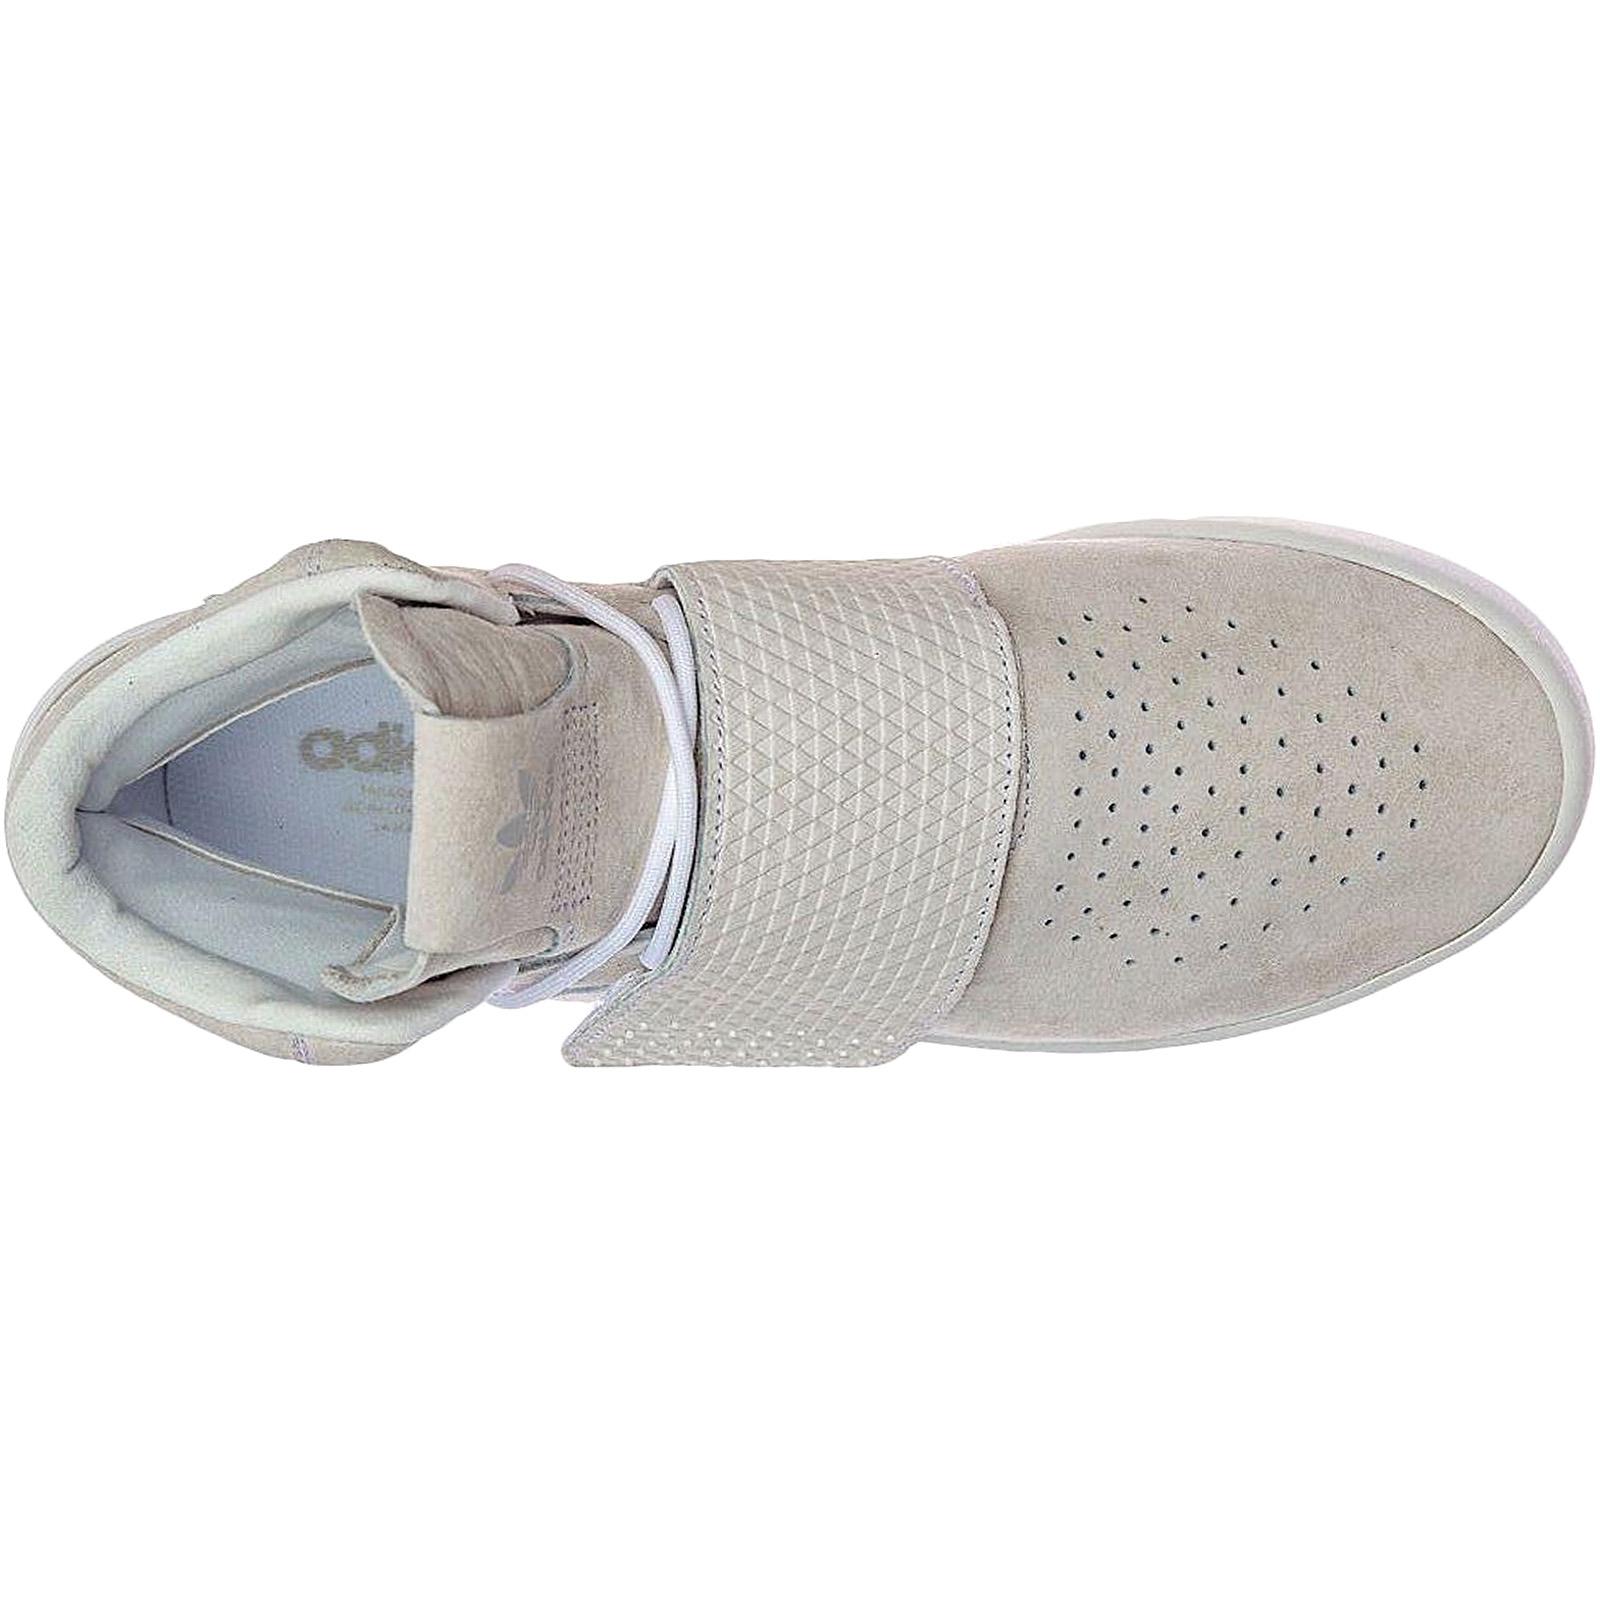 adidas-Originals-Mens-Tubular-Invader-Strap-Casual-Lace-Up-Hi-Top-Trainers-Shoes thumbnail 24